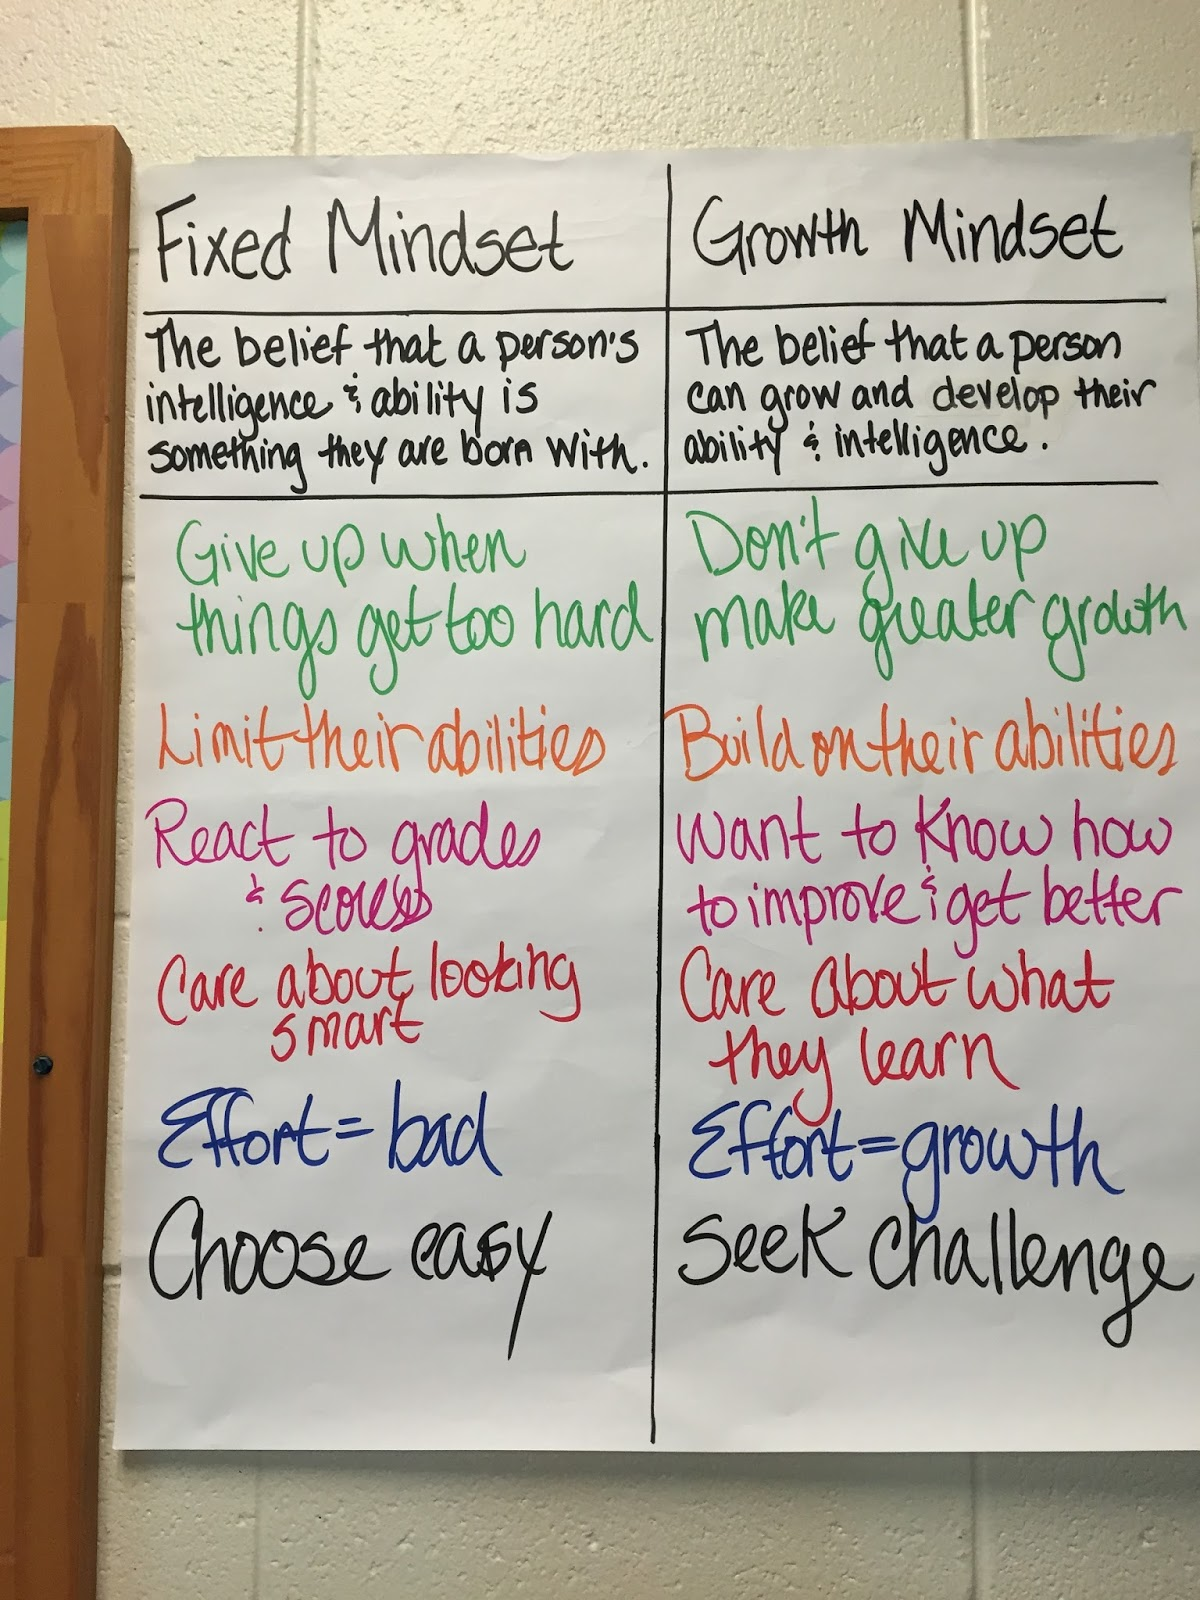 5th Grade Growth Mindset Vs Fixed Mindset